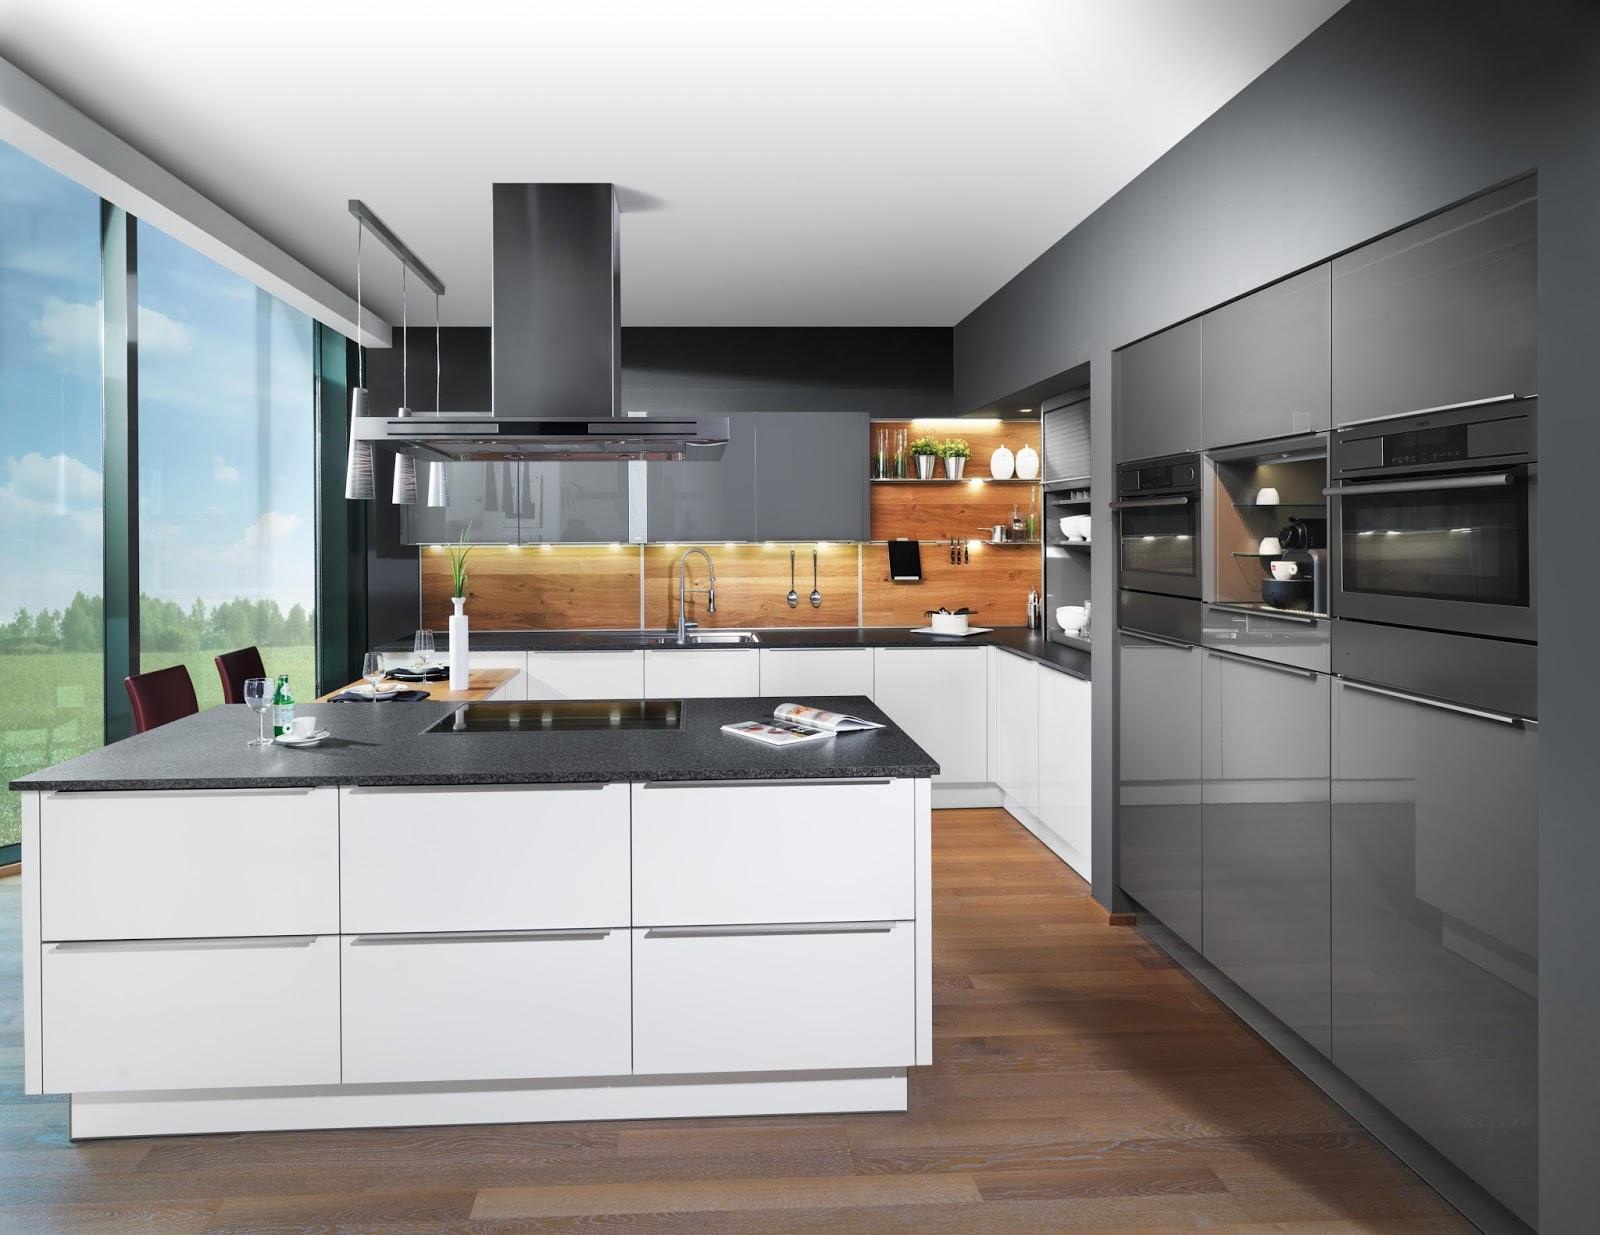 k chen aktuell st ckheim page 241 revampedbook. Black Bedroom Furniture Sets. Home Design Ideas